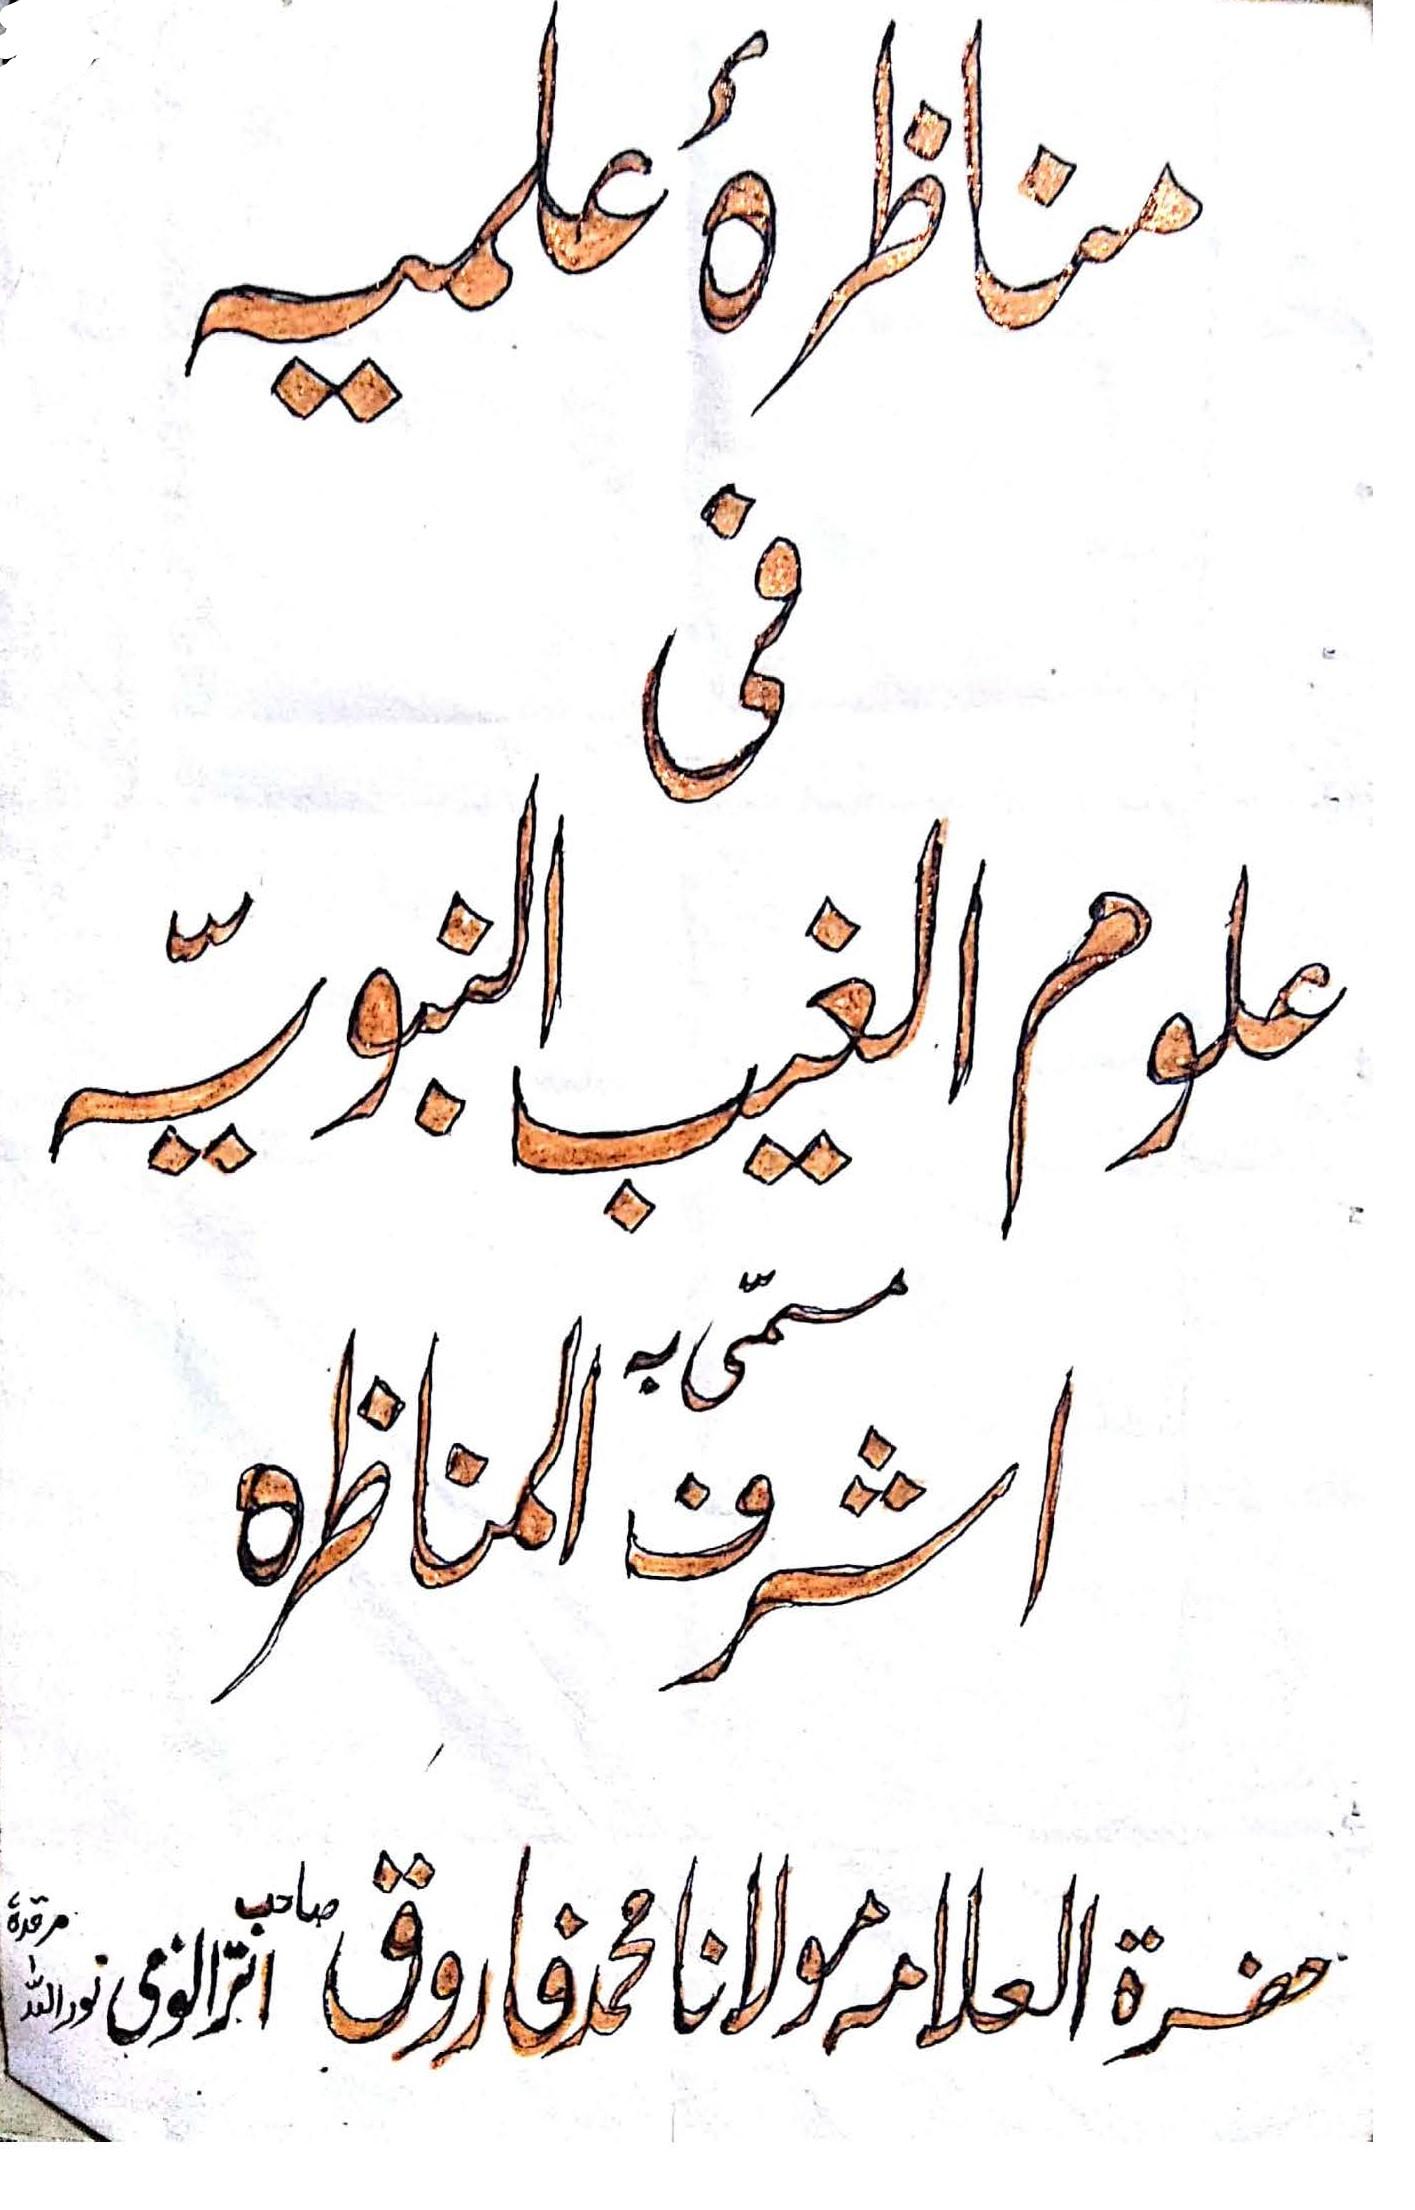 Munazira i Ilmiyah Fi Uloom al Ghayb al Nabawiyyah,Maulana Farooq Utranvi ra